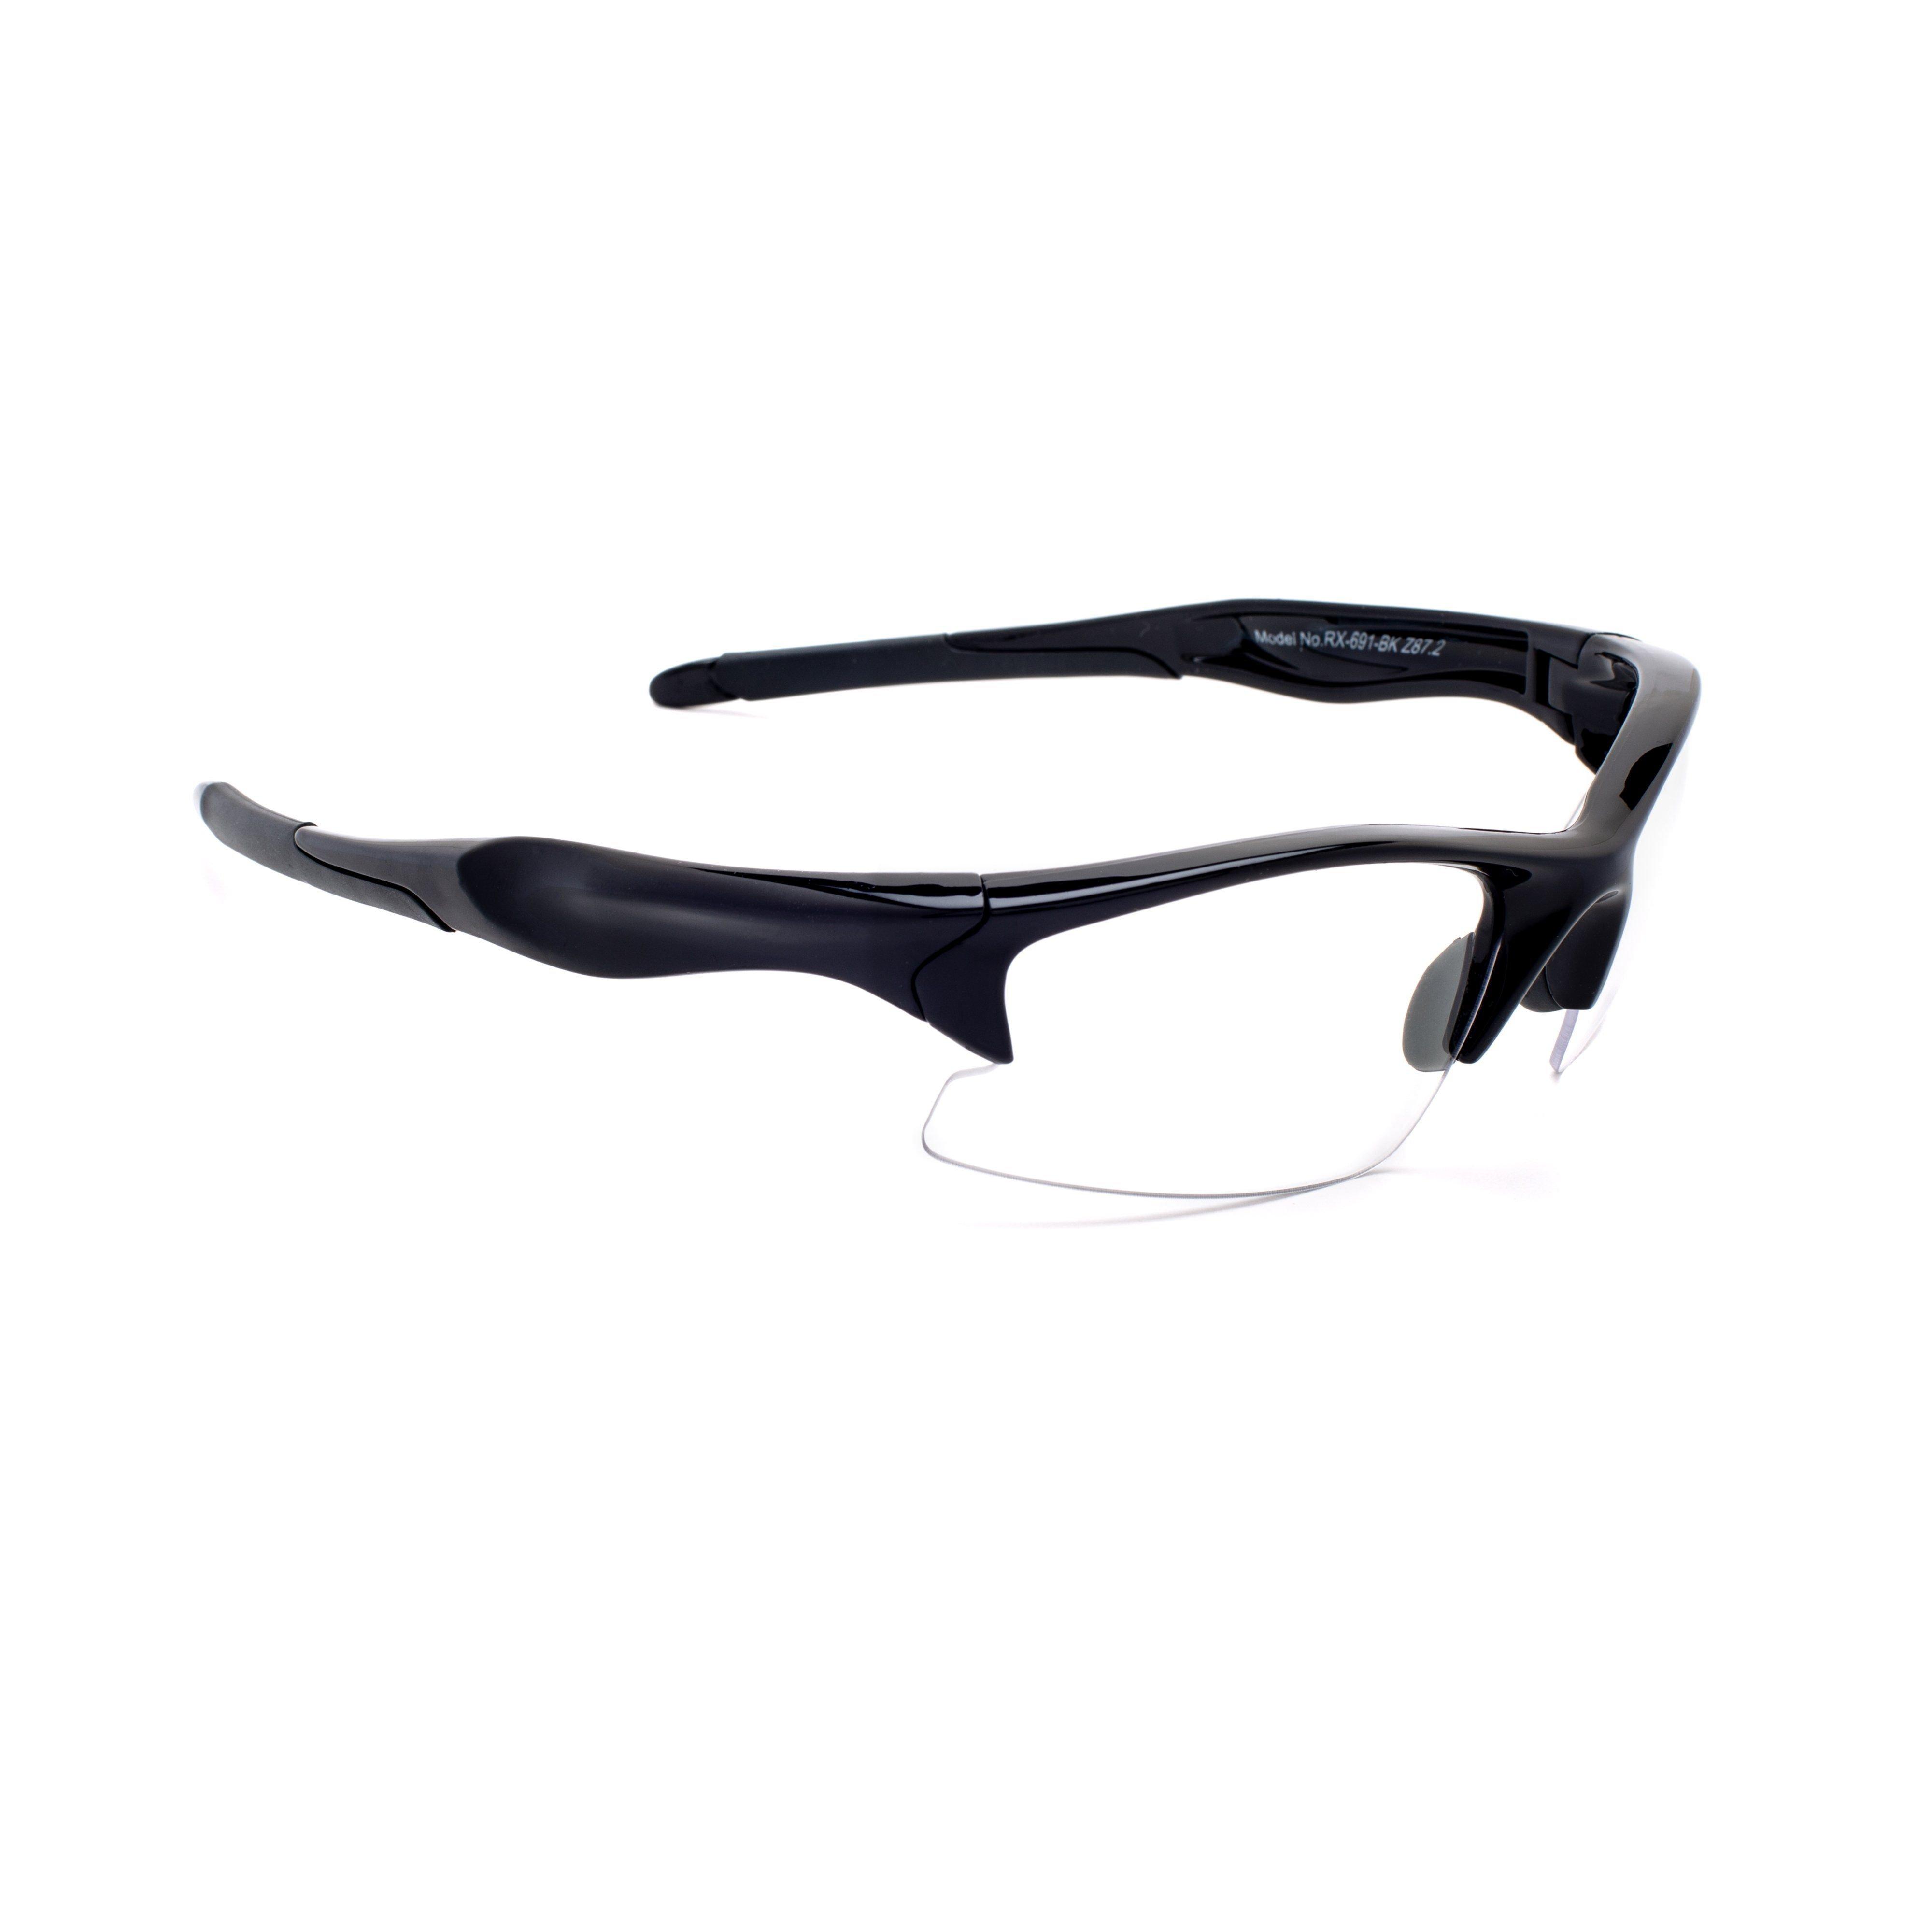 9b91617fe9c Buy Prescription Safety Glasses RX-691 - Rx Safety